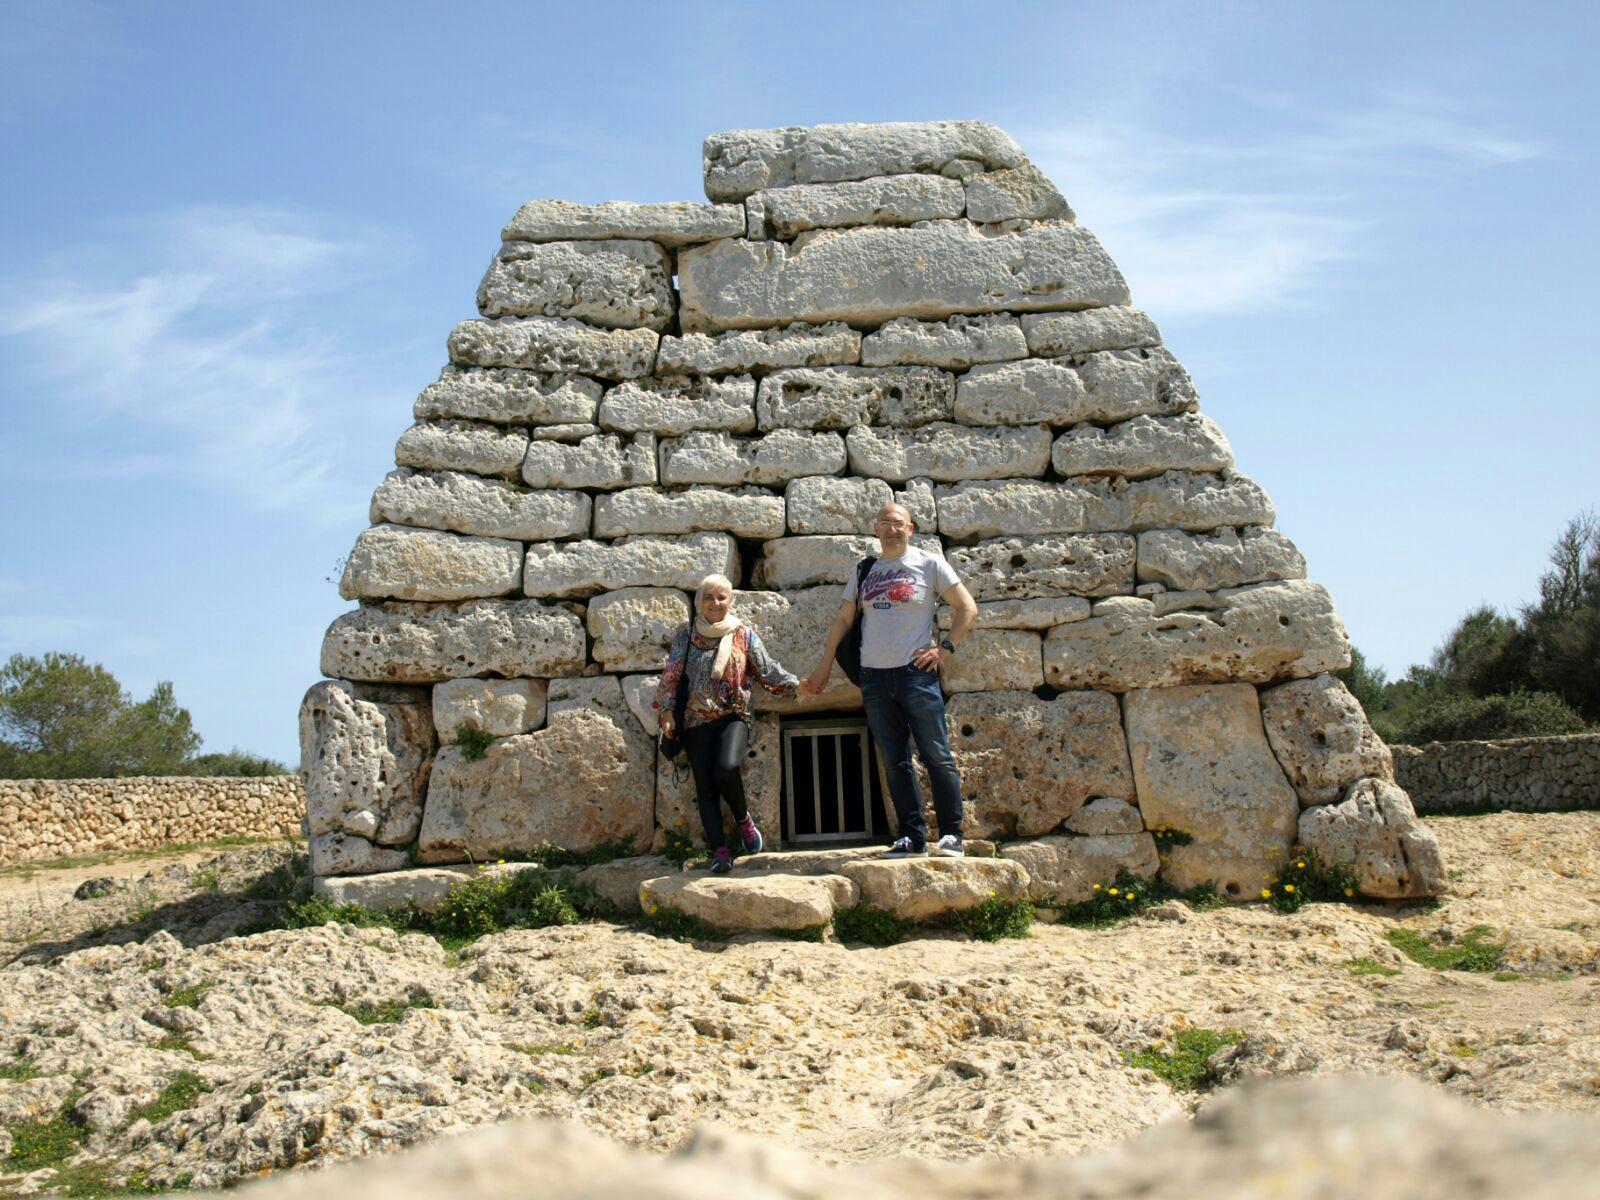 Ferran y Toni en la Naveta des Tudons en Menorca.